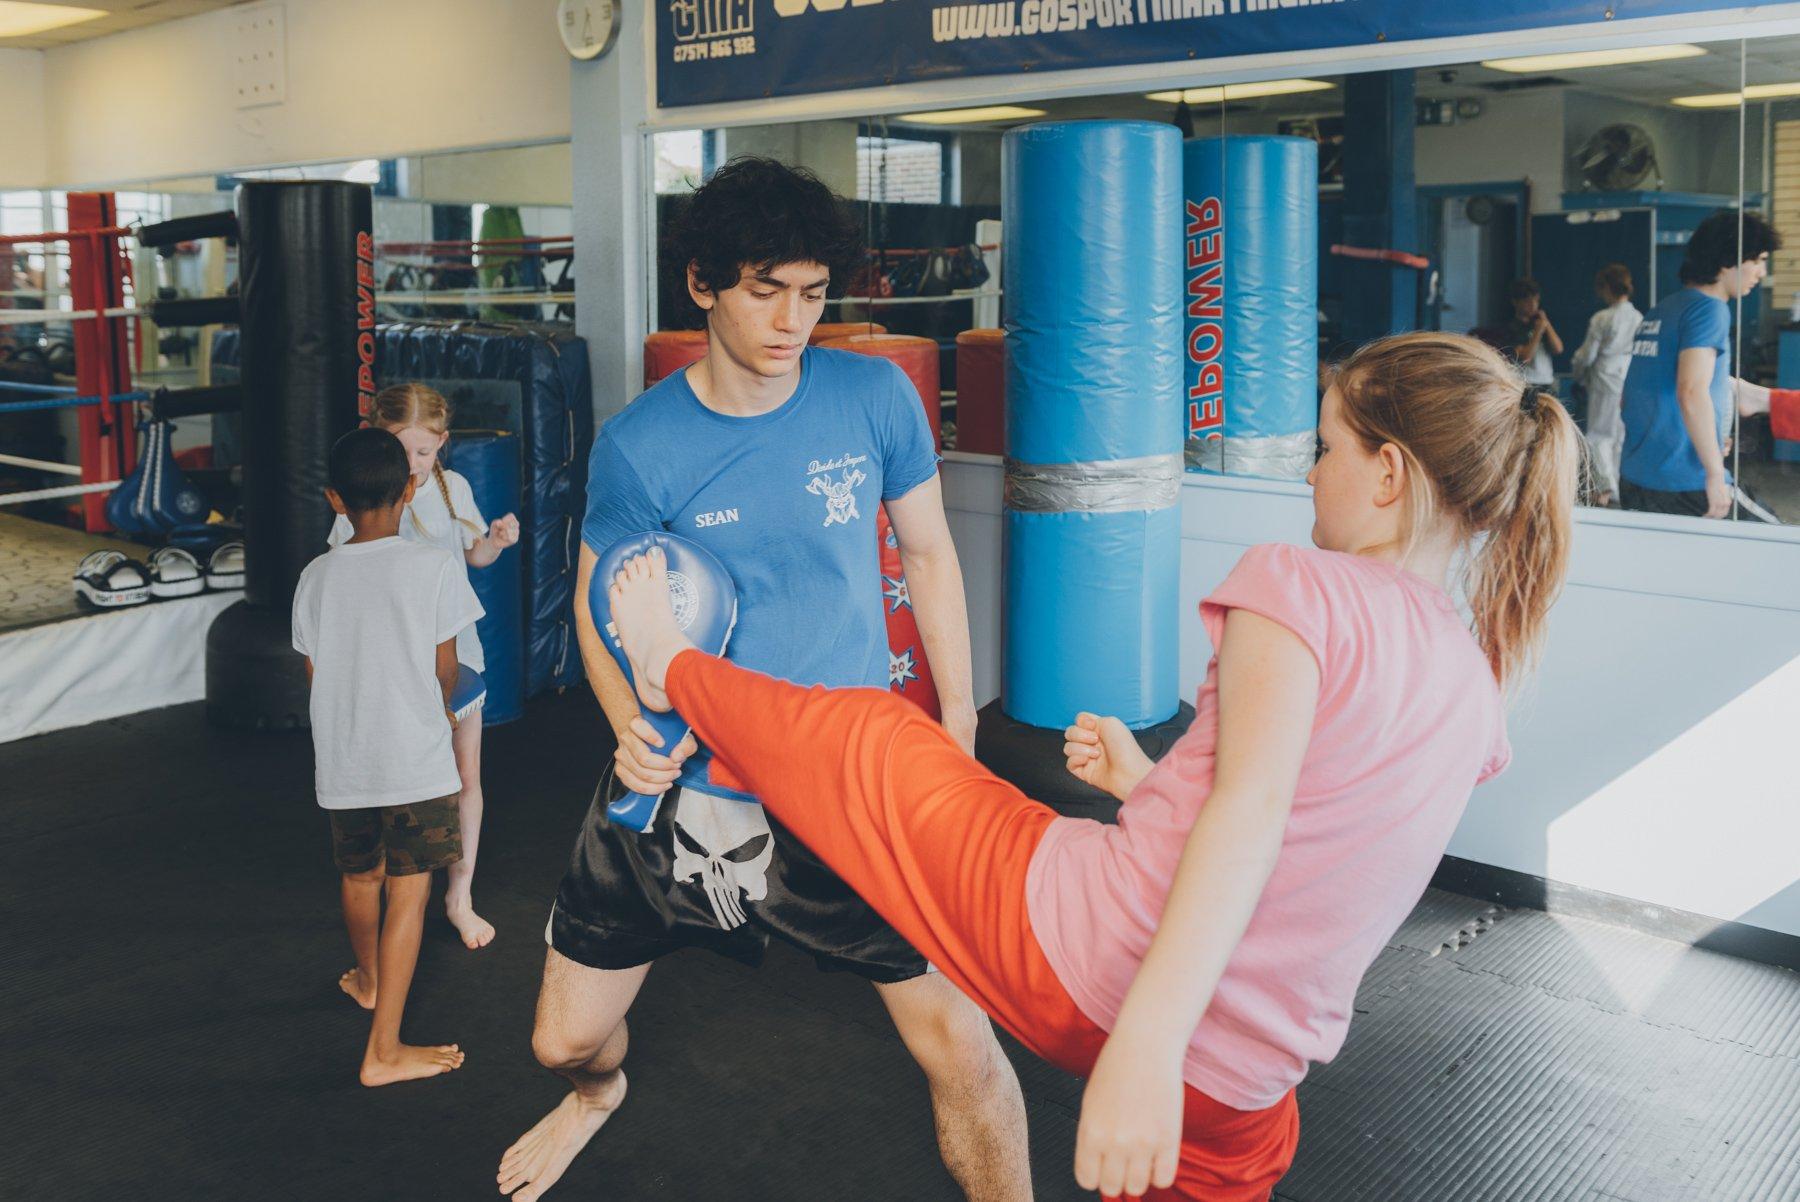 kids martial arts classes near me in gosport